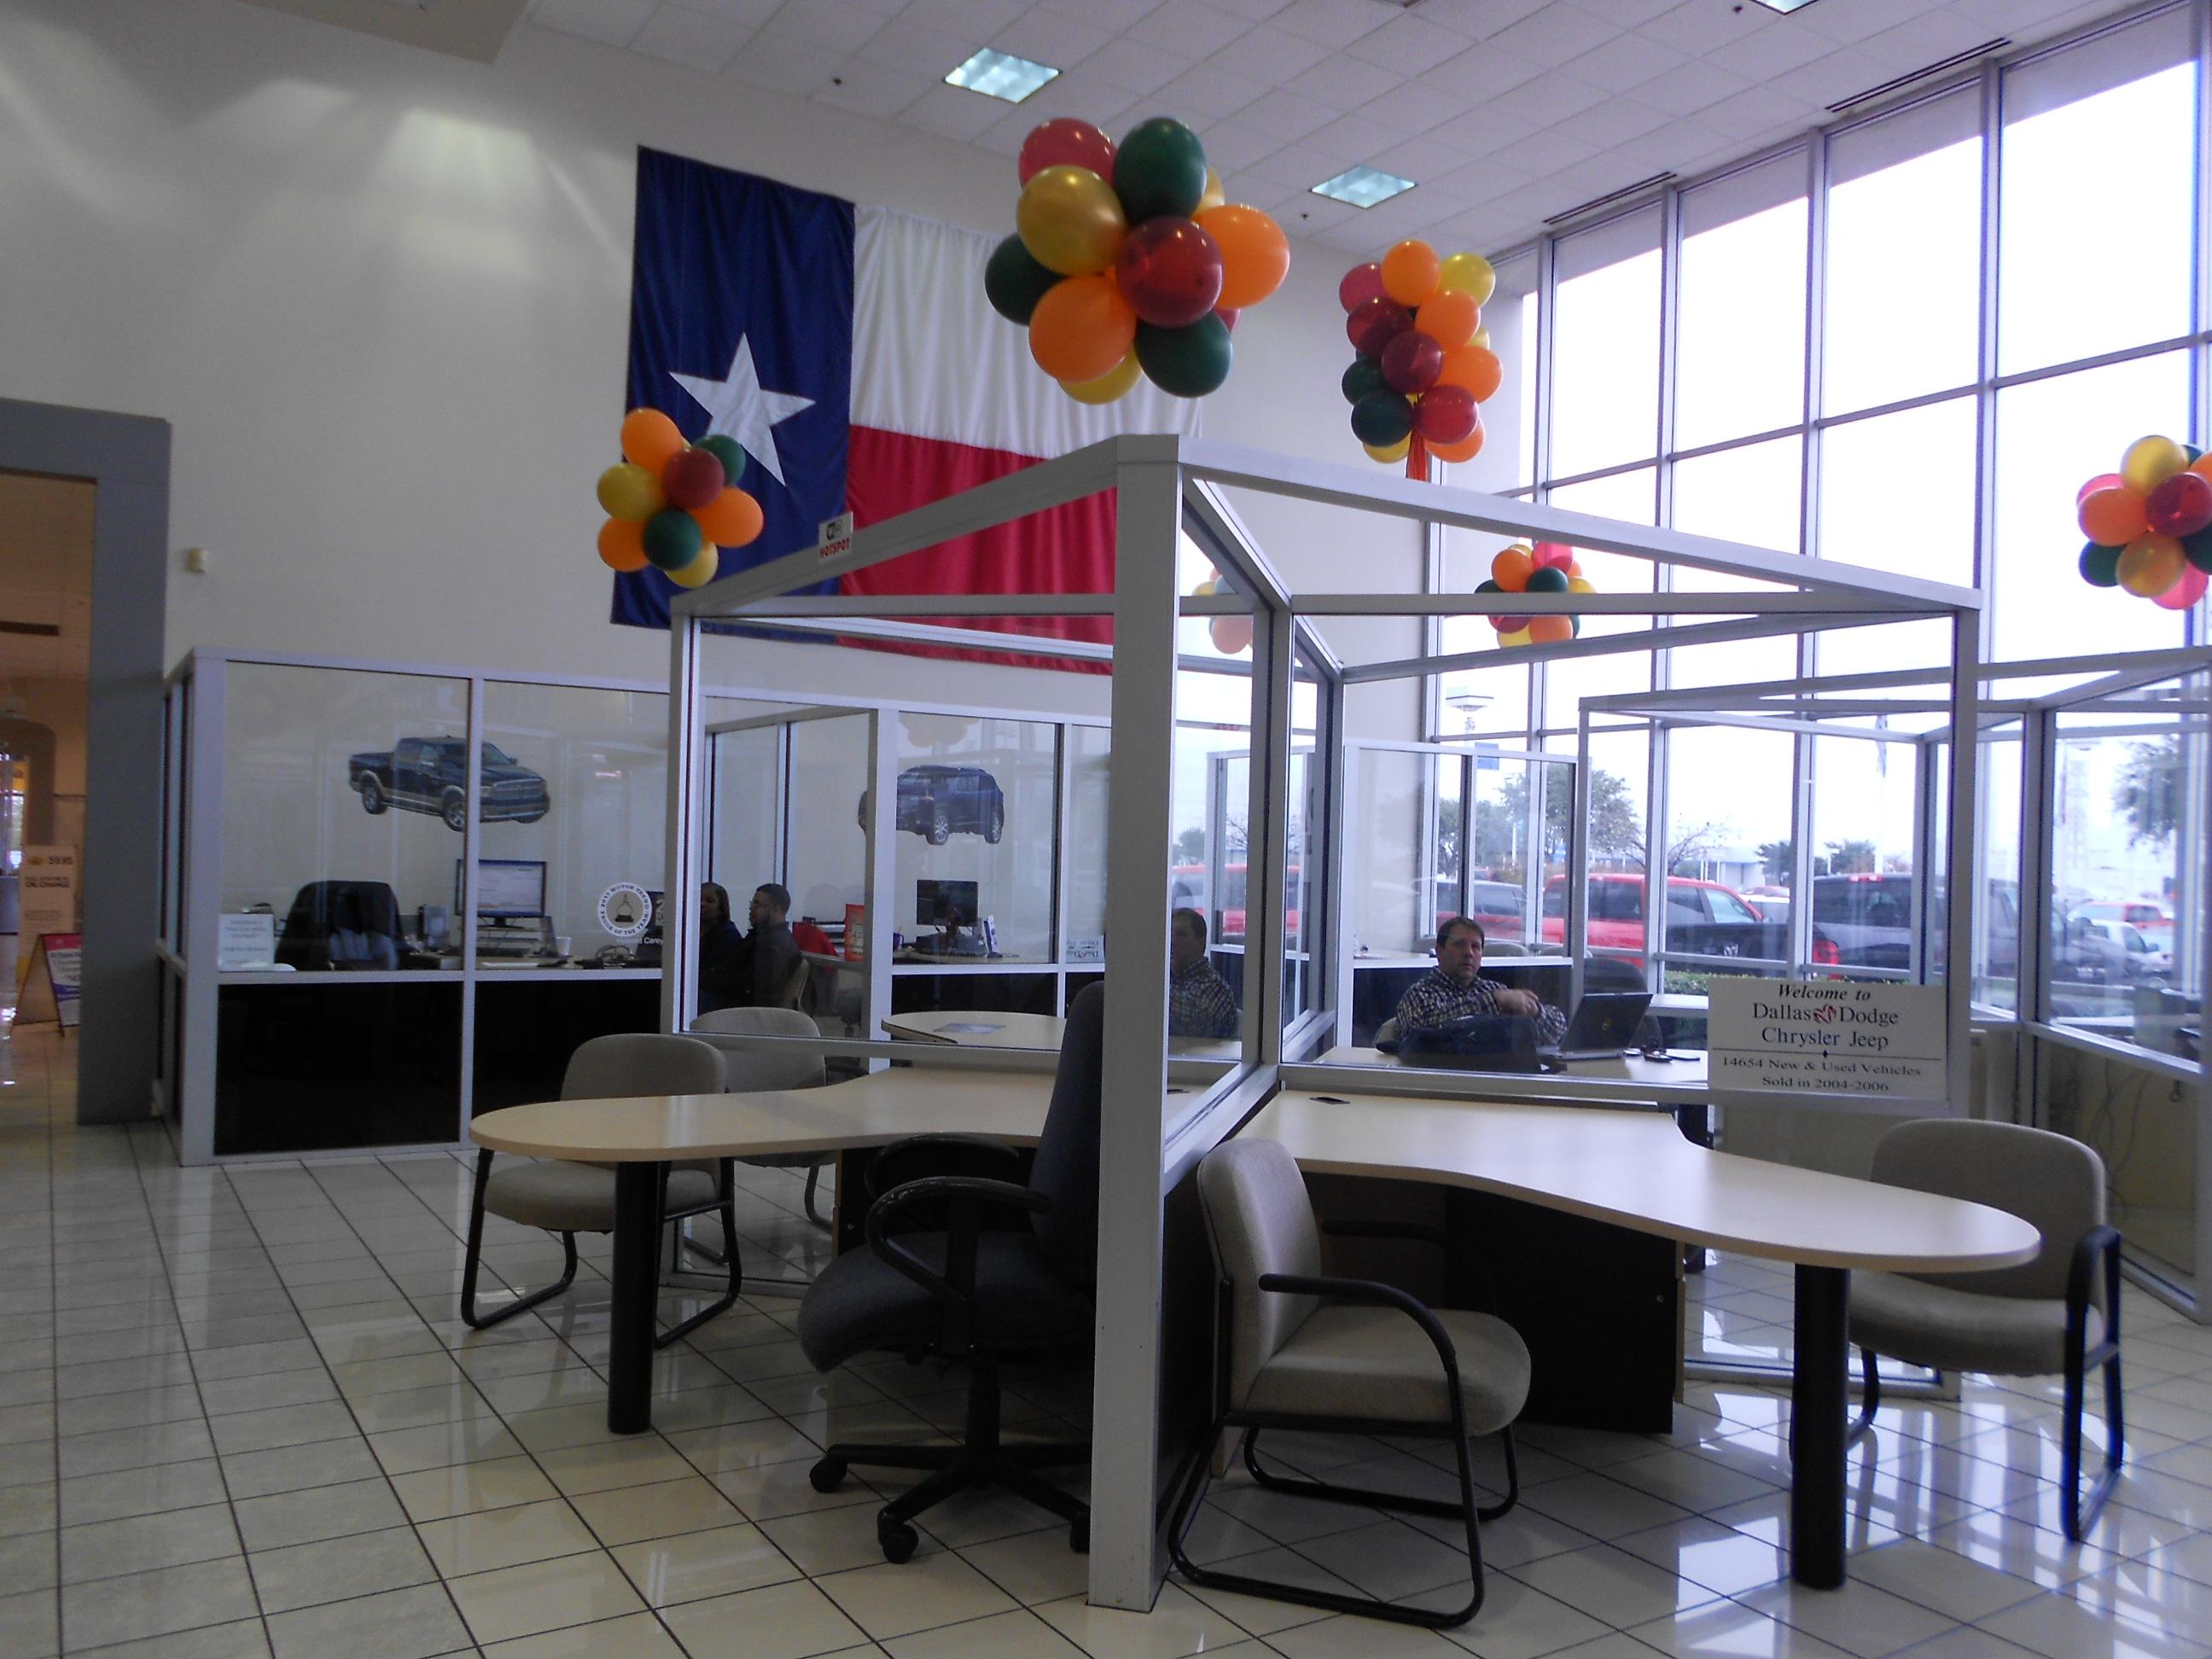 lbj chrysler mapquest us freeway jeep dealers dallas tx auto ram texas business dodge